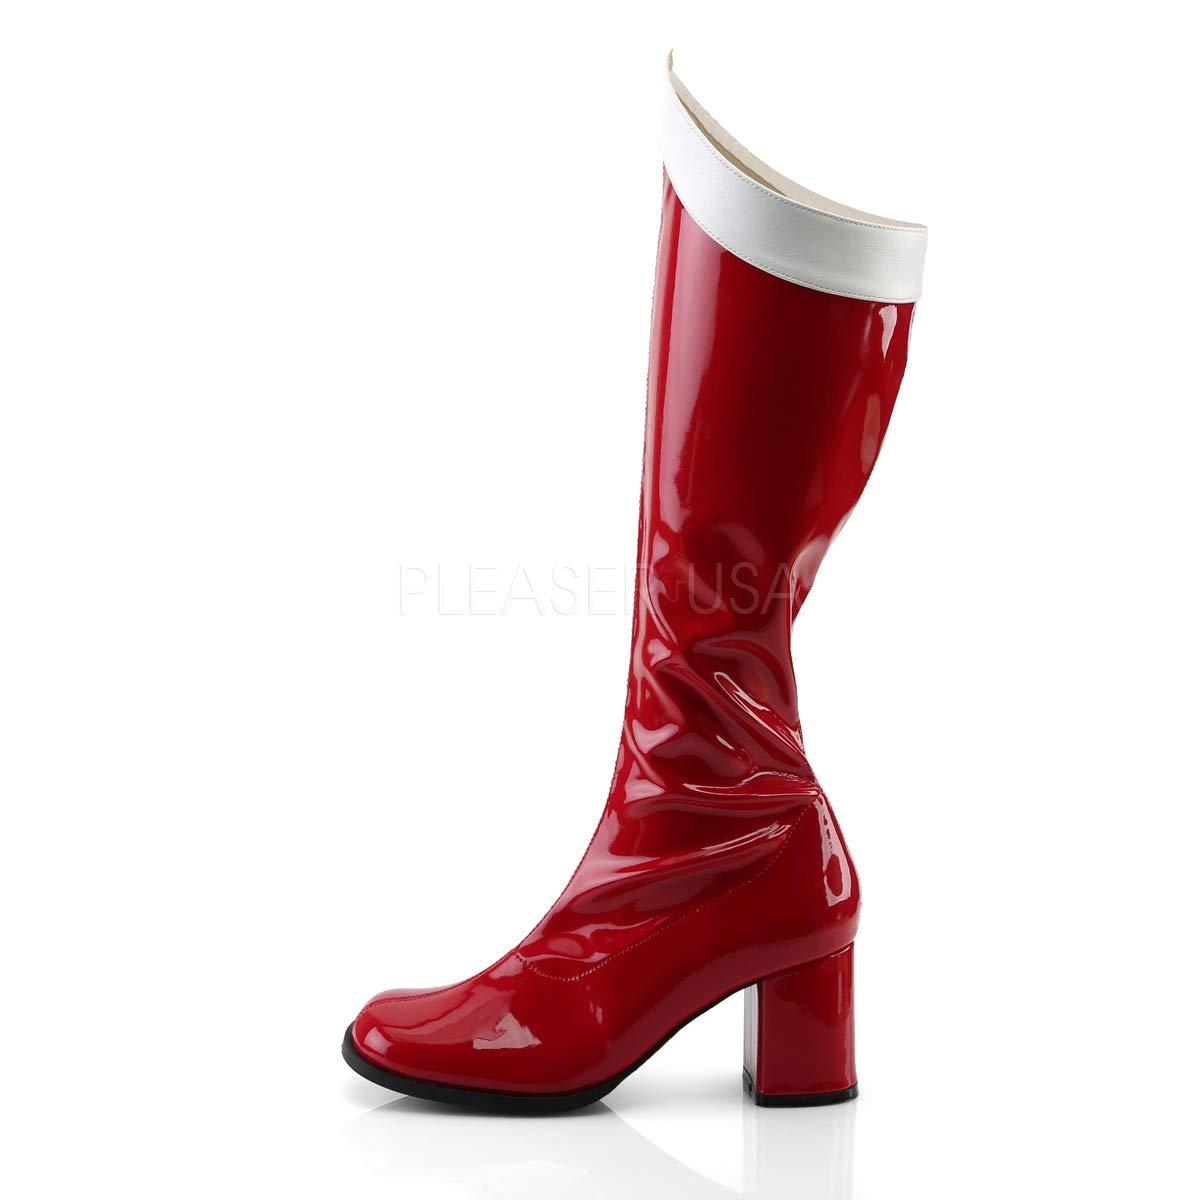 Funtasma Womens Gogo-306 Knee High Boot